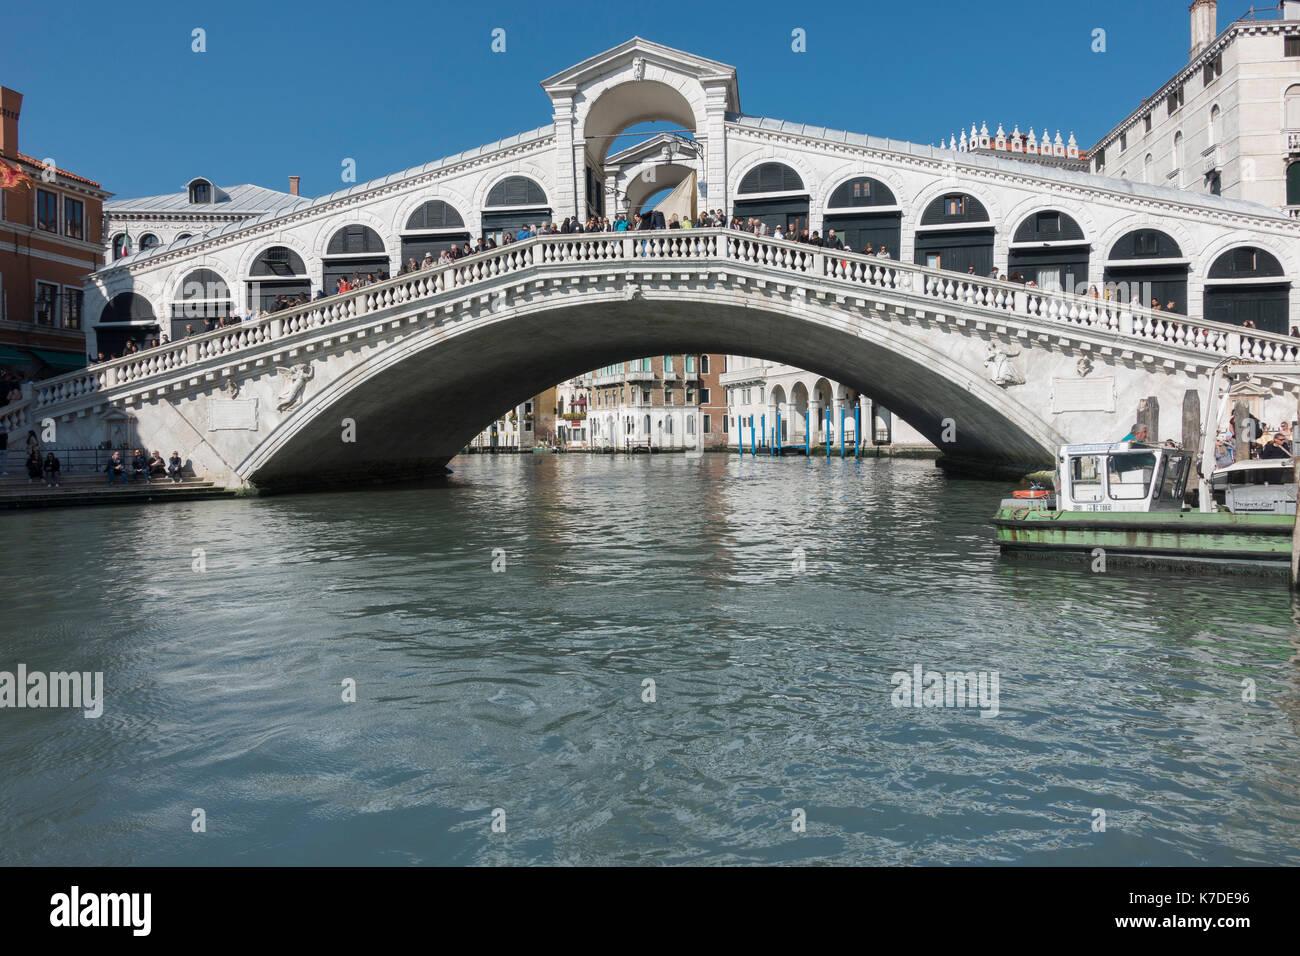 Rialto Bridge, Canal Grande, Venice, Venice, Veneto, Italy - Stock Image